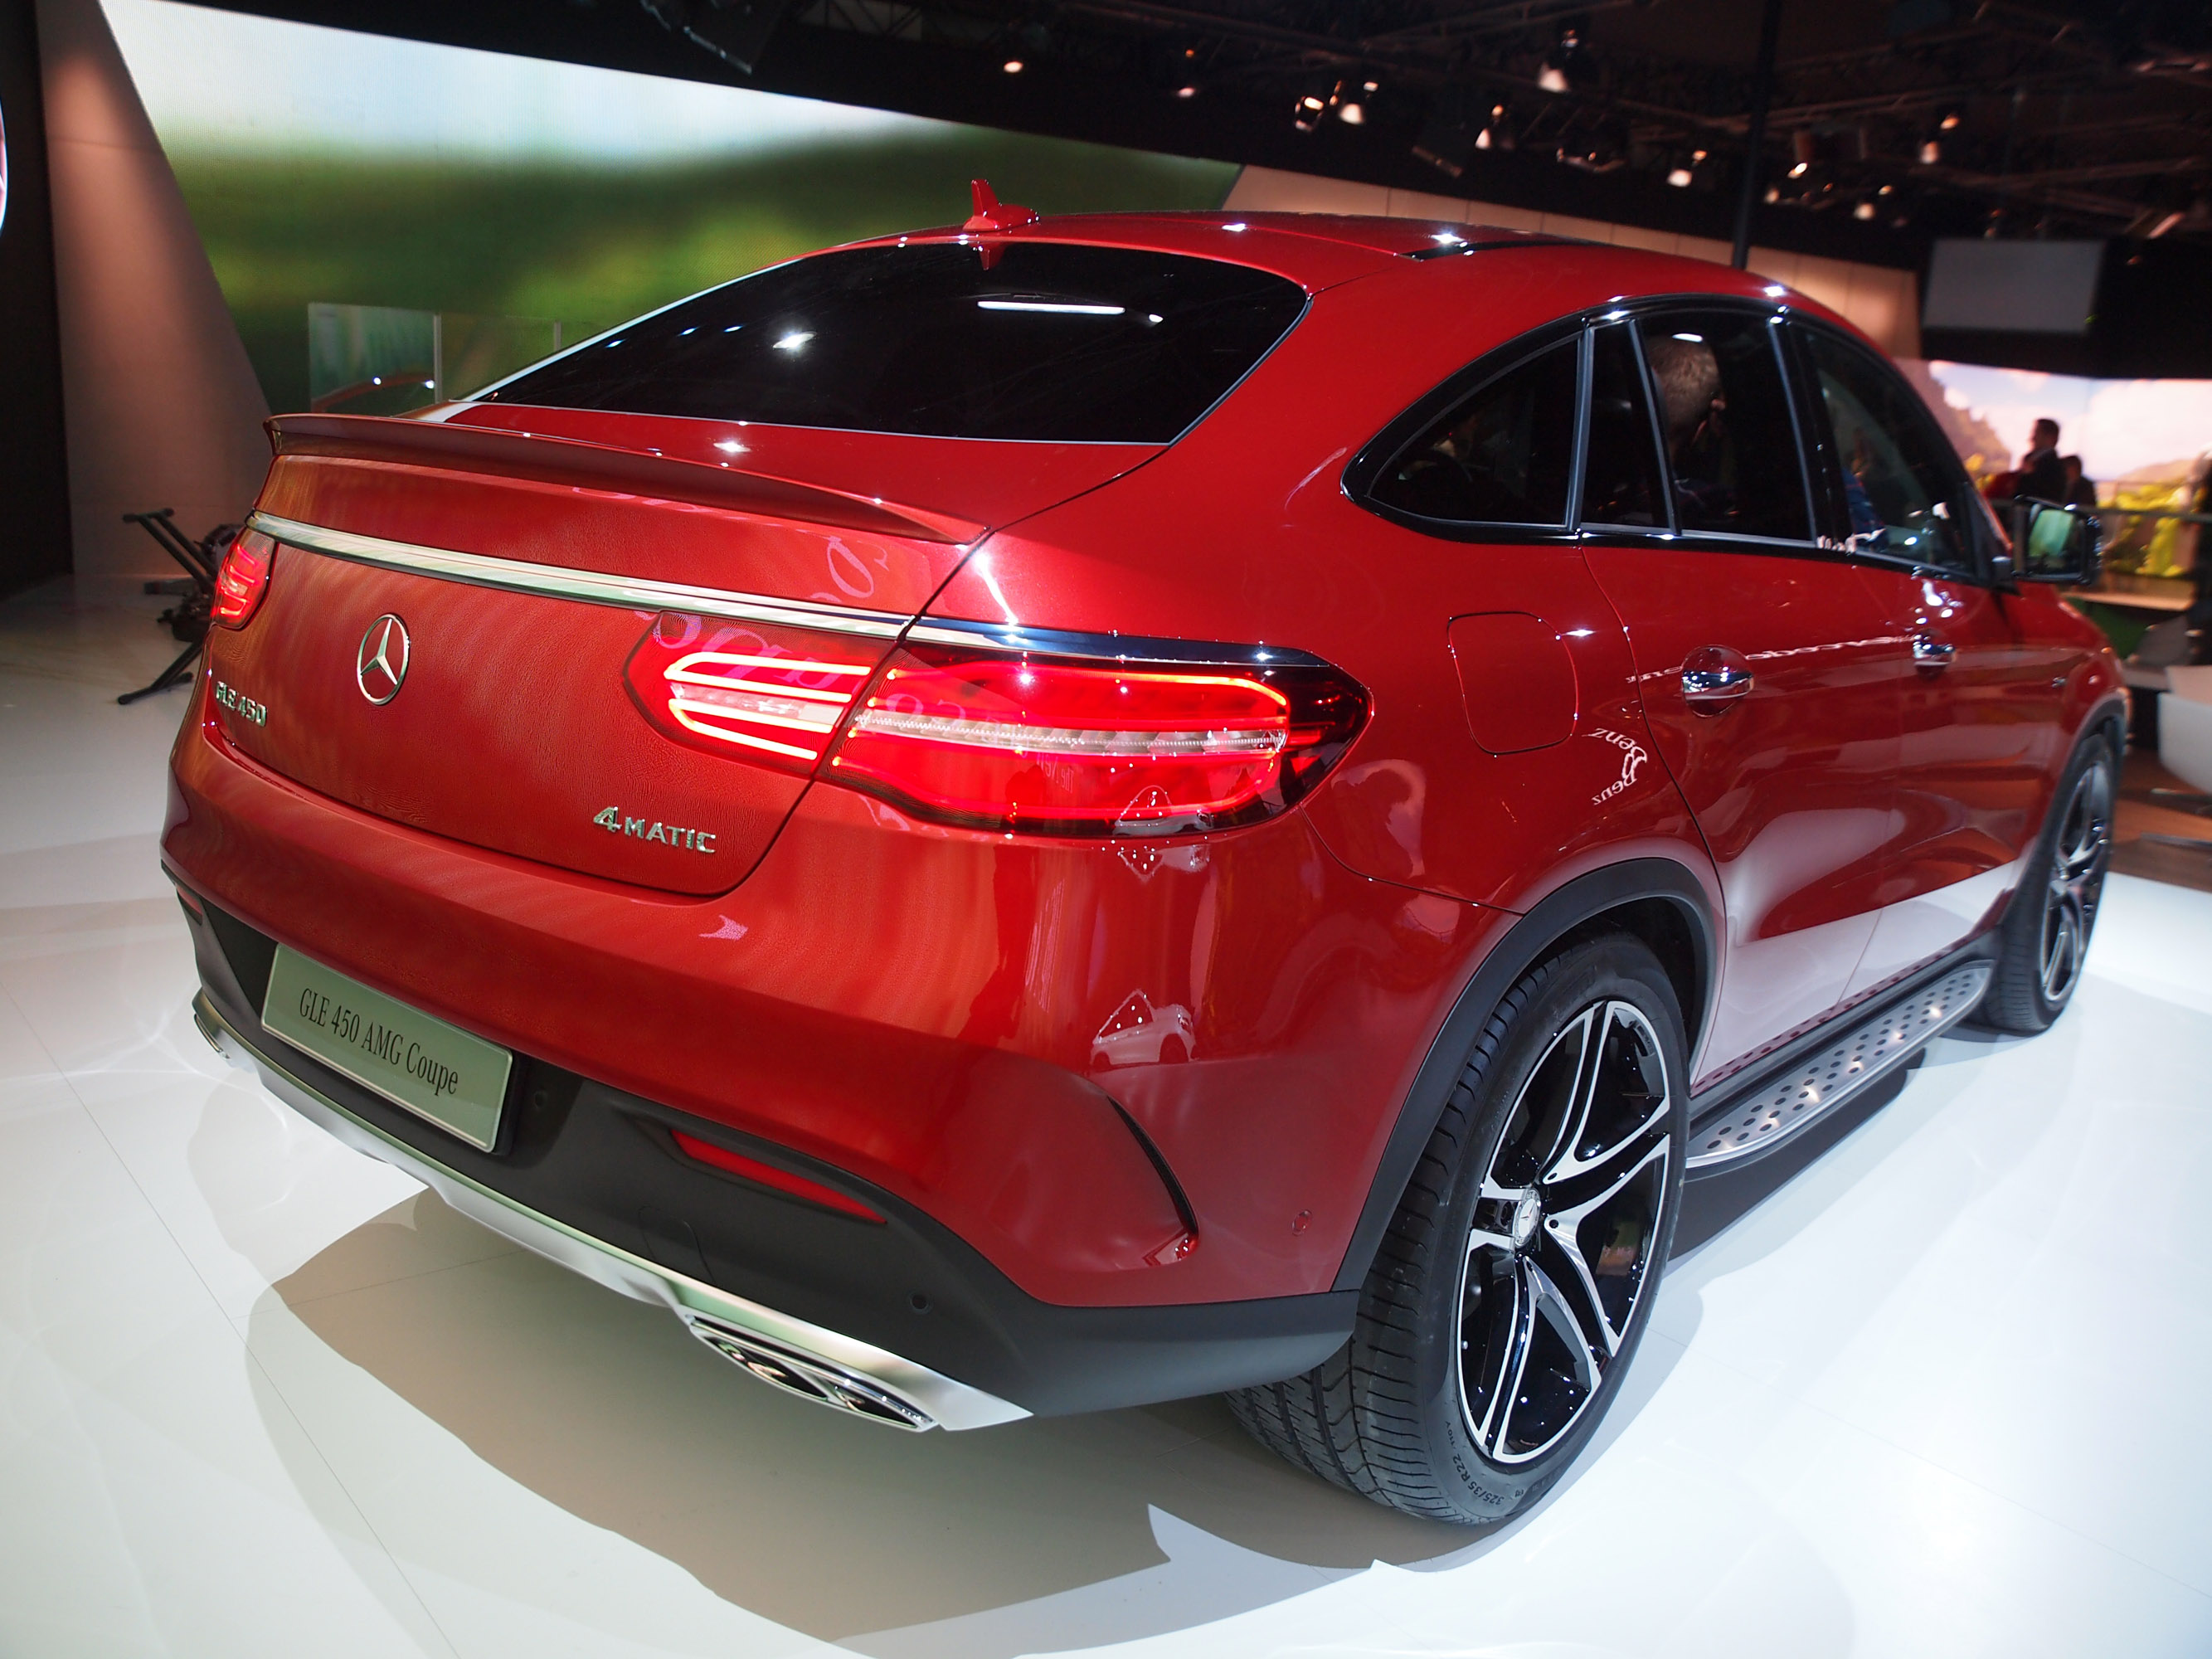 Mercedes benz brand will support jurassic world with for Mercedes benz support